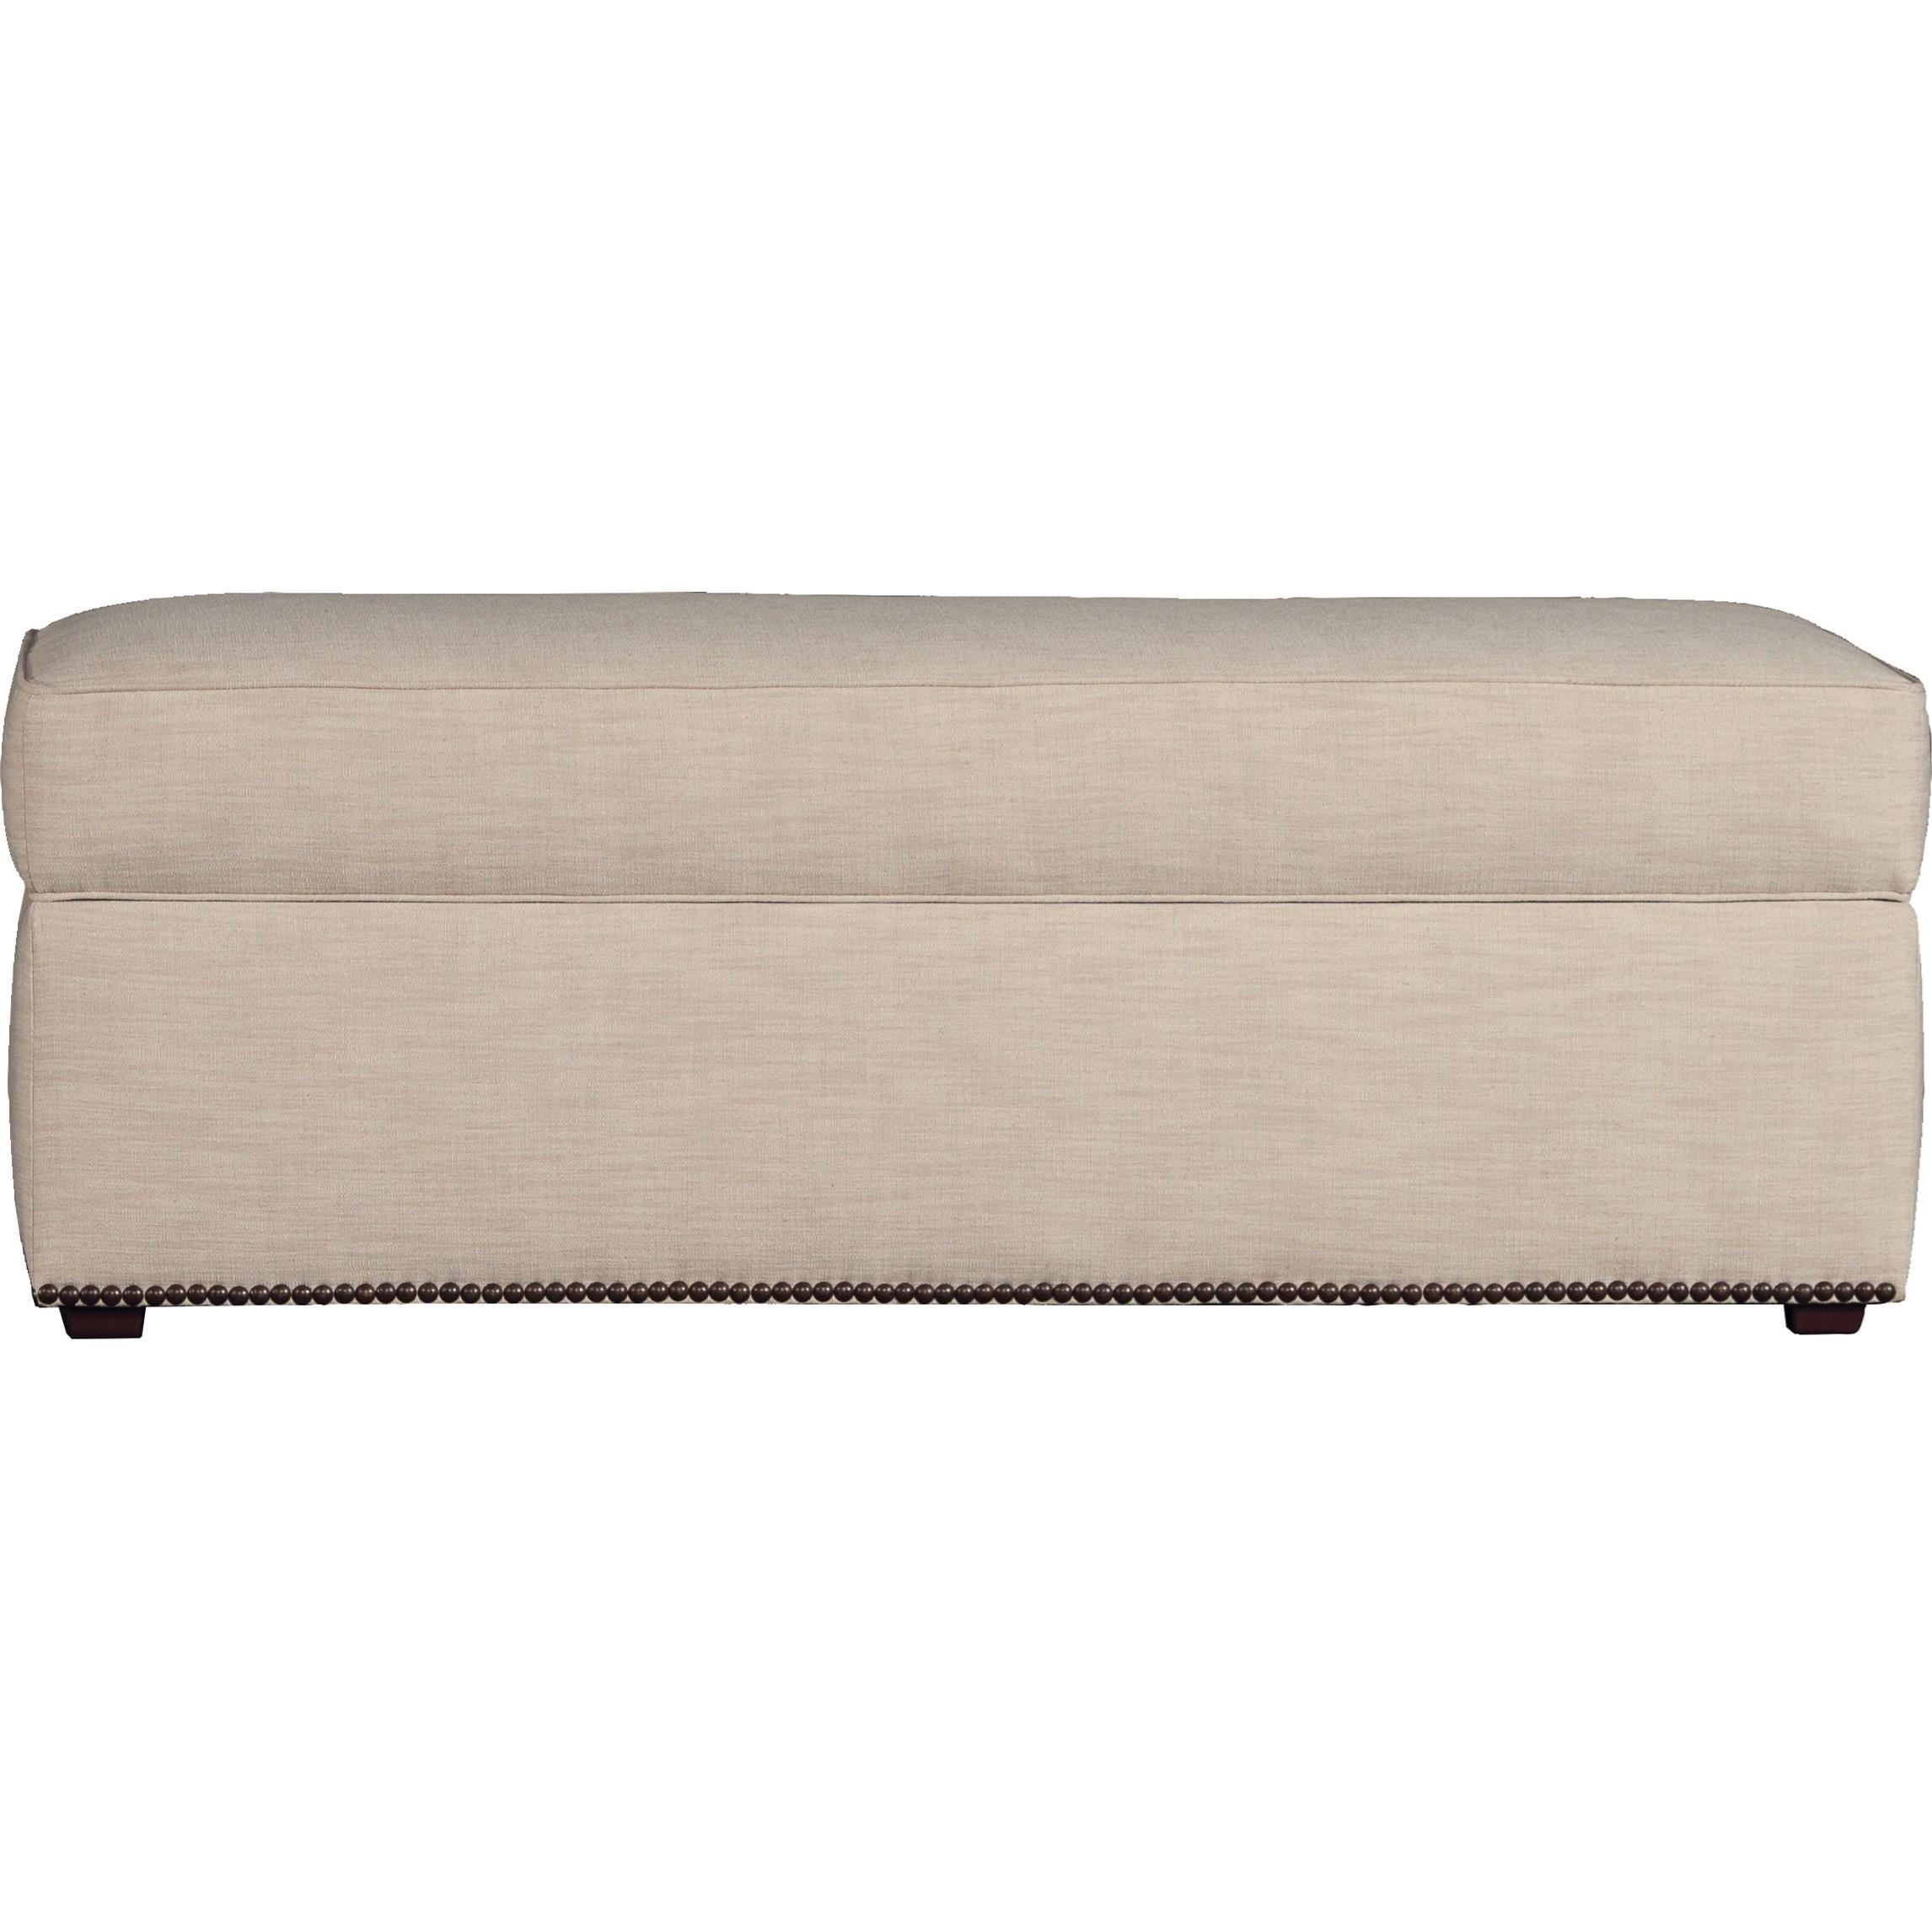 7140 Small Storage Bench by Mayo at Pedigo Furniture